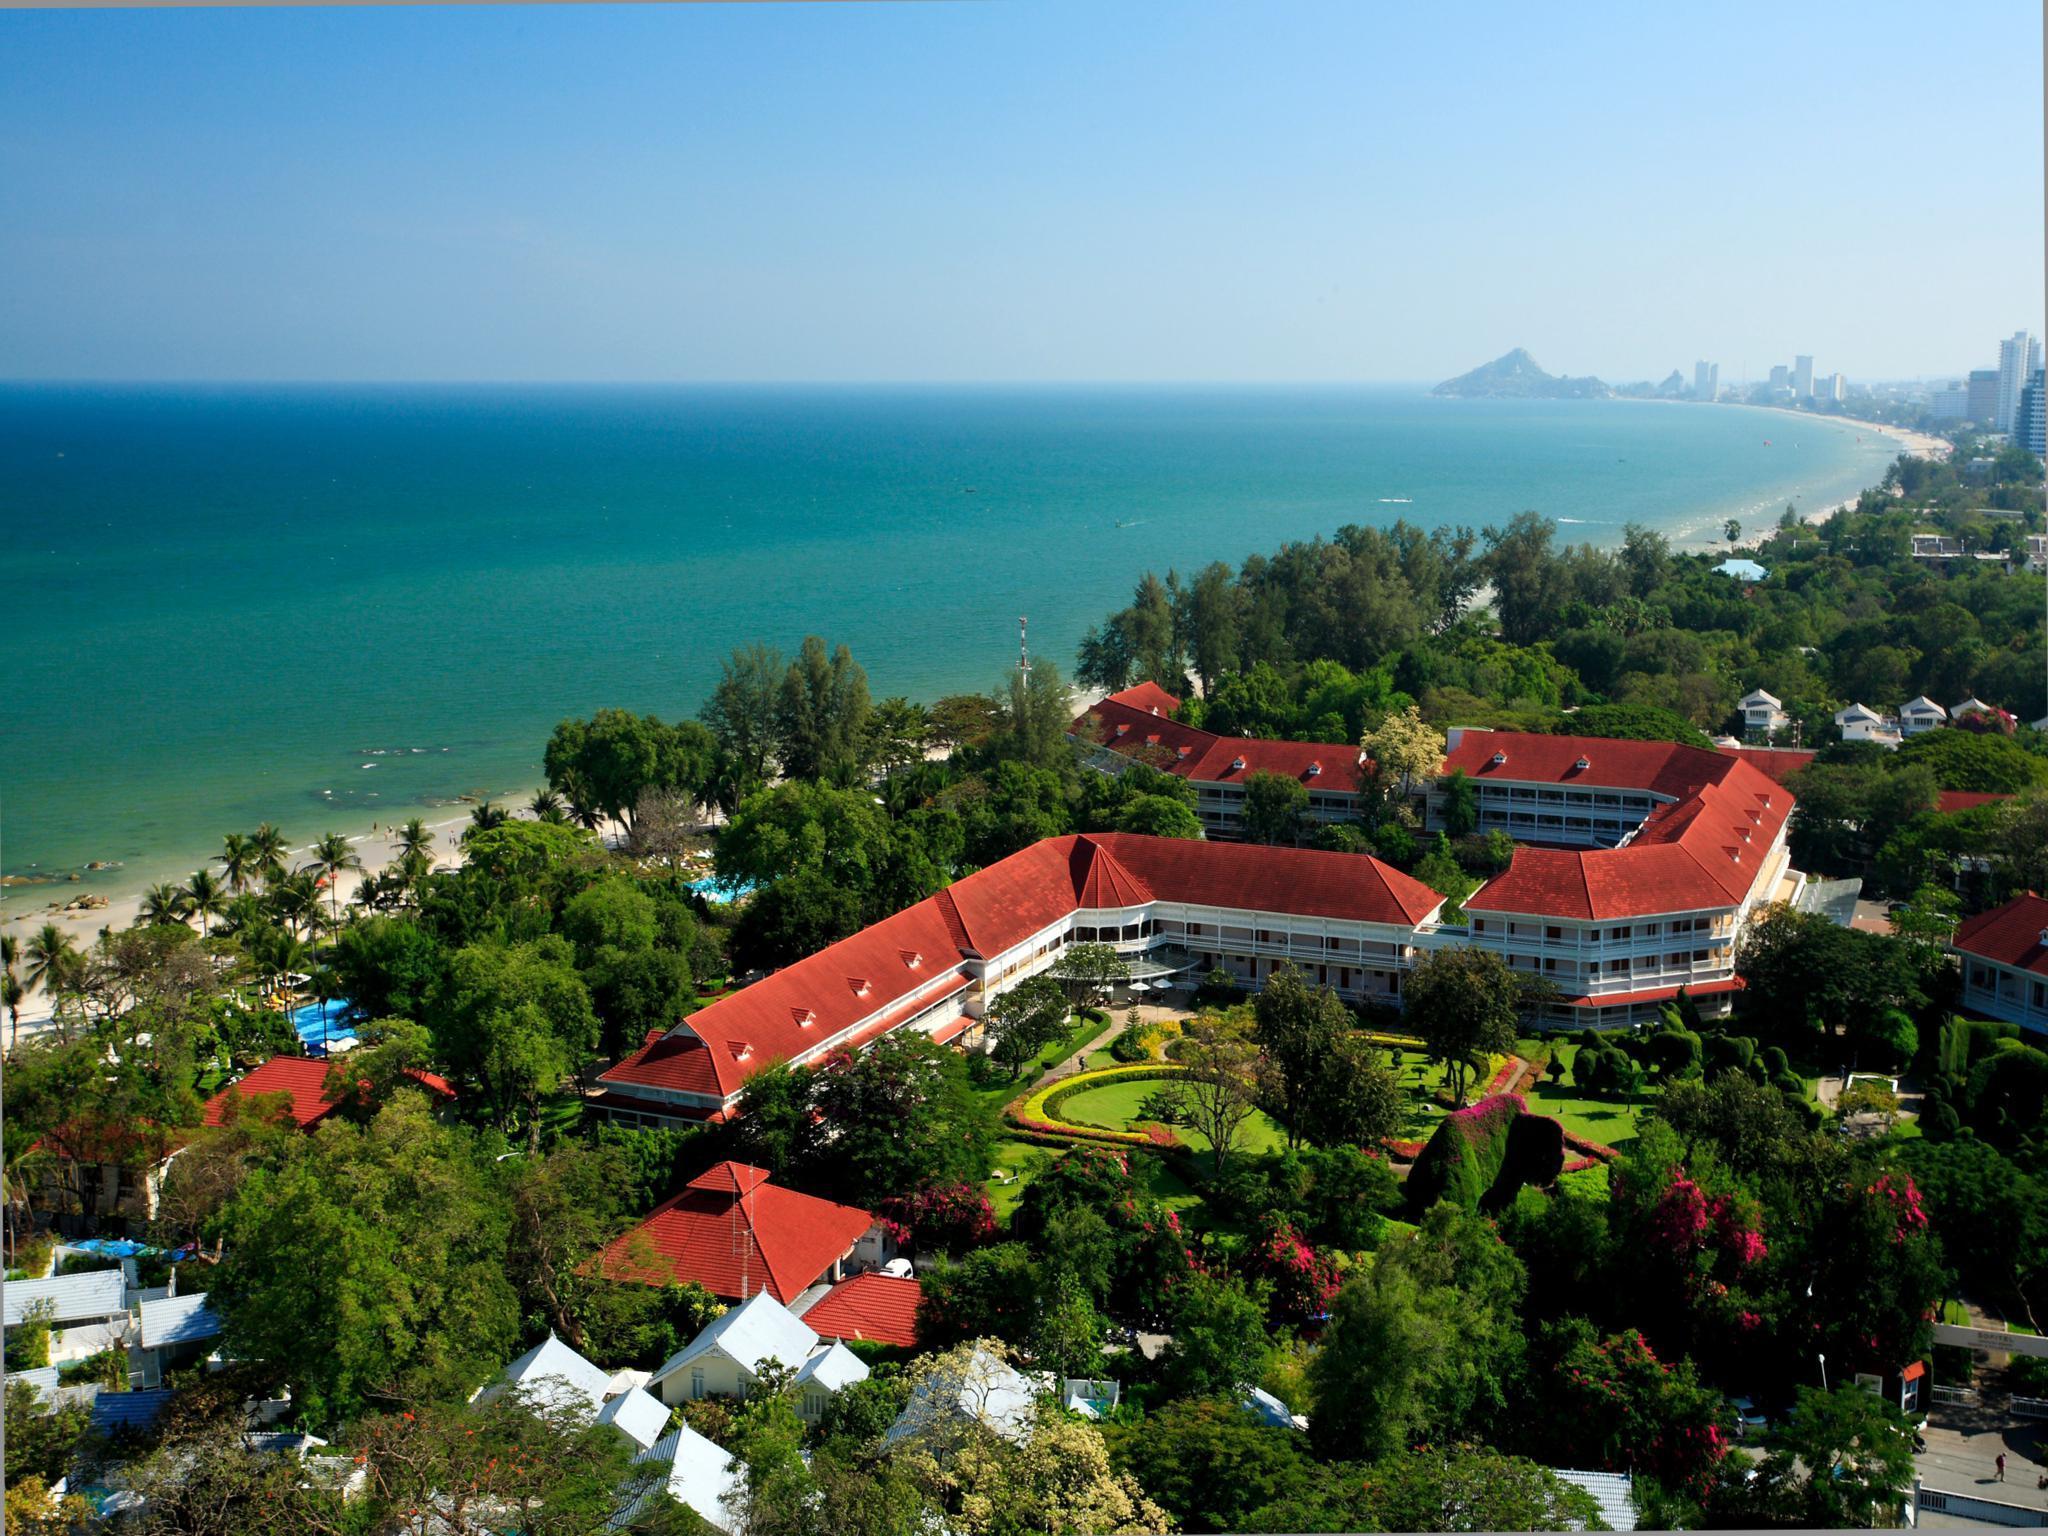 Centara Grand Beach Resort & Villas Hua Hin - Hua Hin